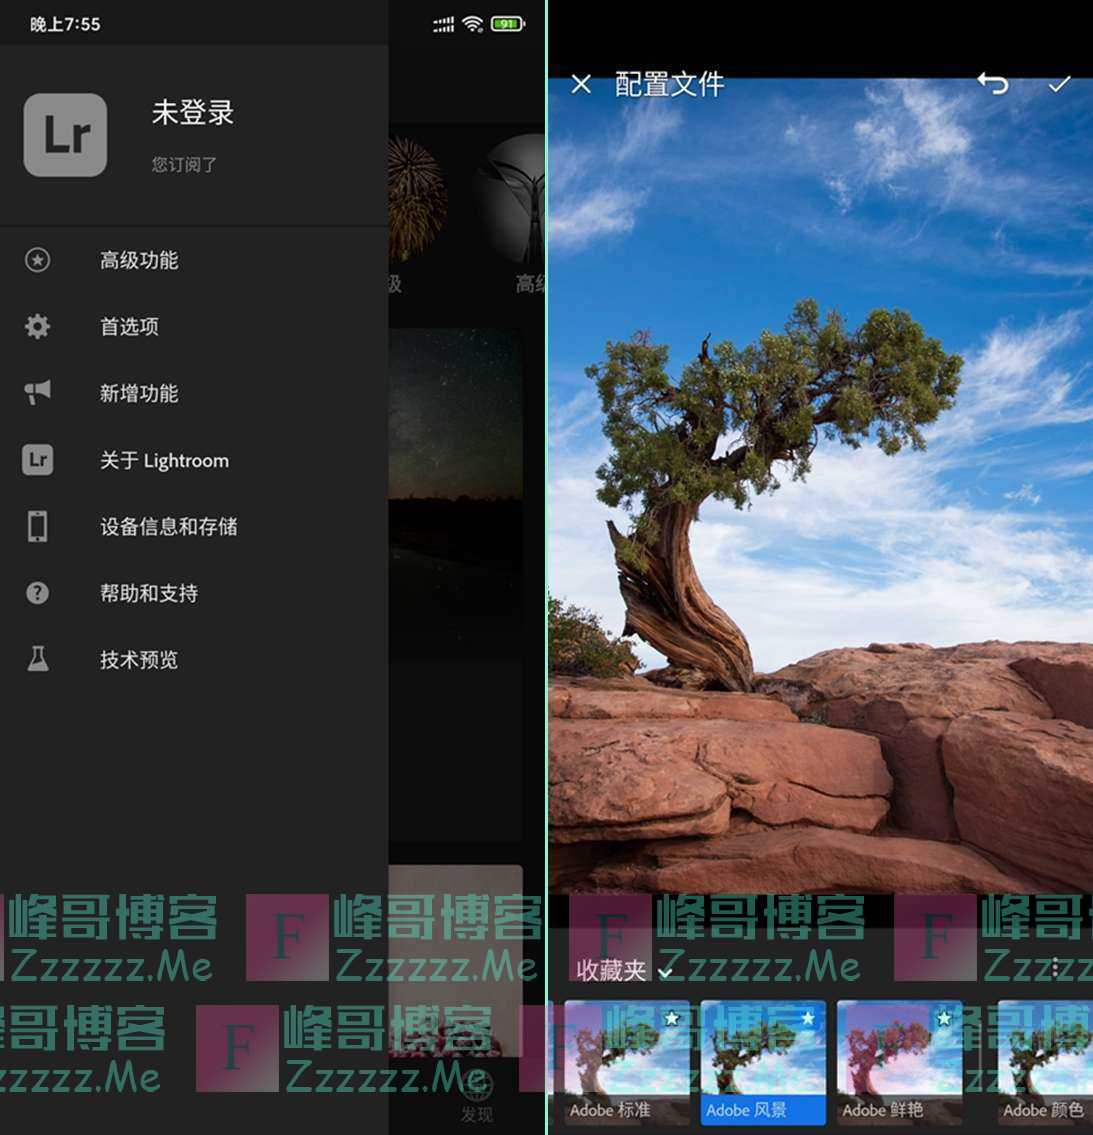 安卓Lightroom V5.4.1 Adobe Lightroom Pro专业破解版下载